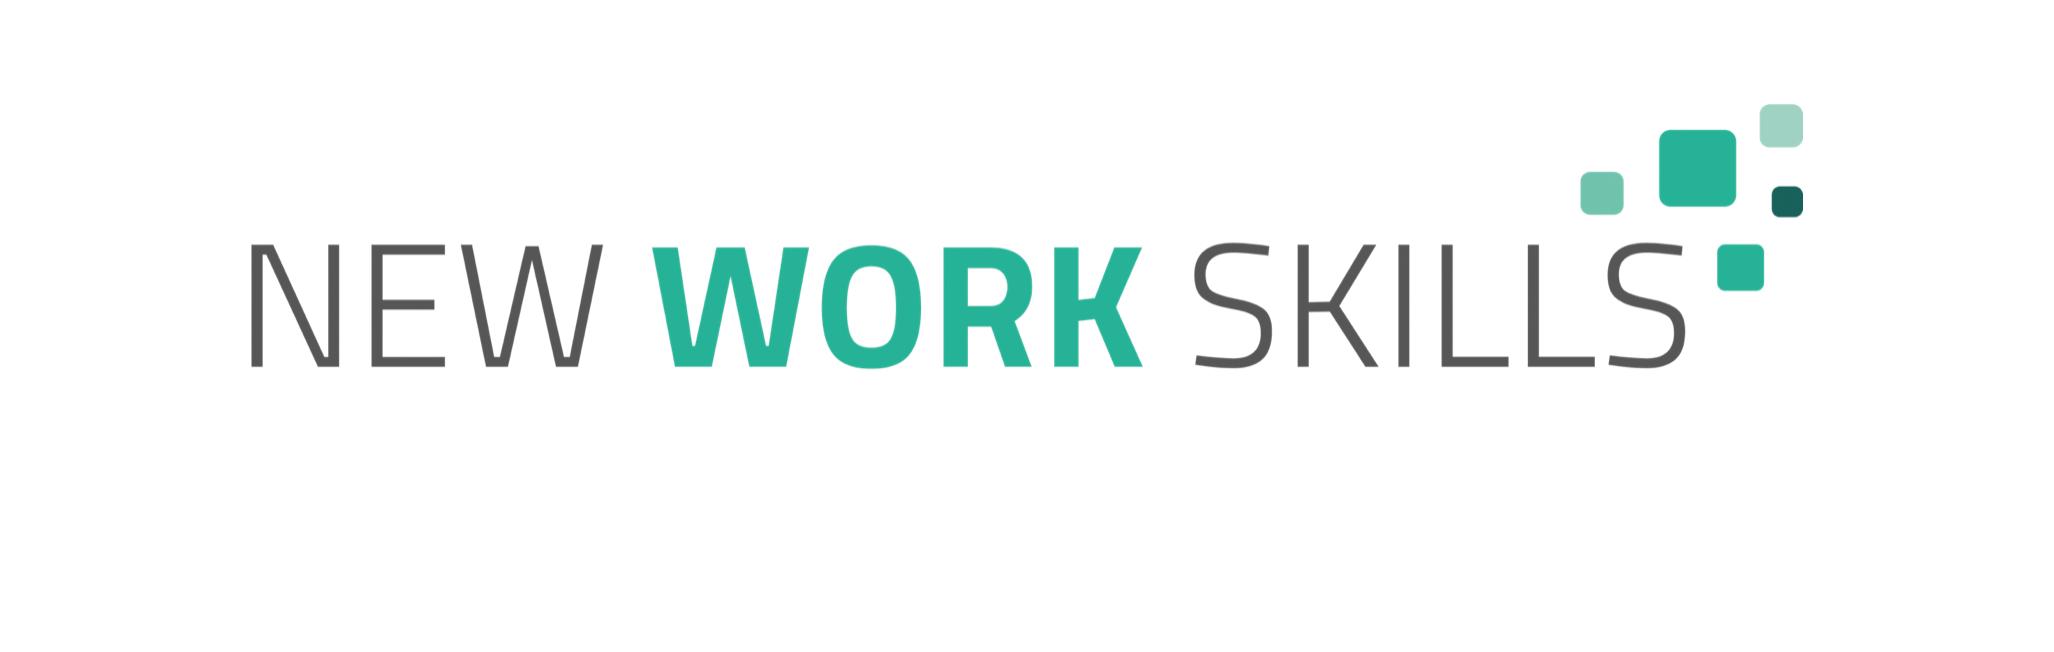 New Work Skills